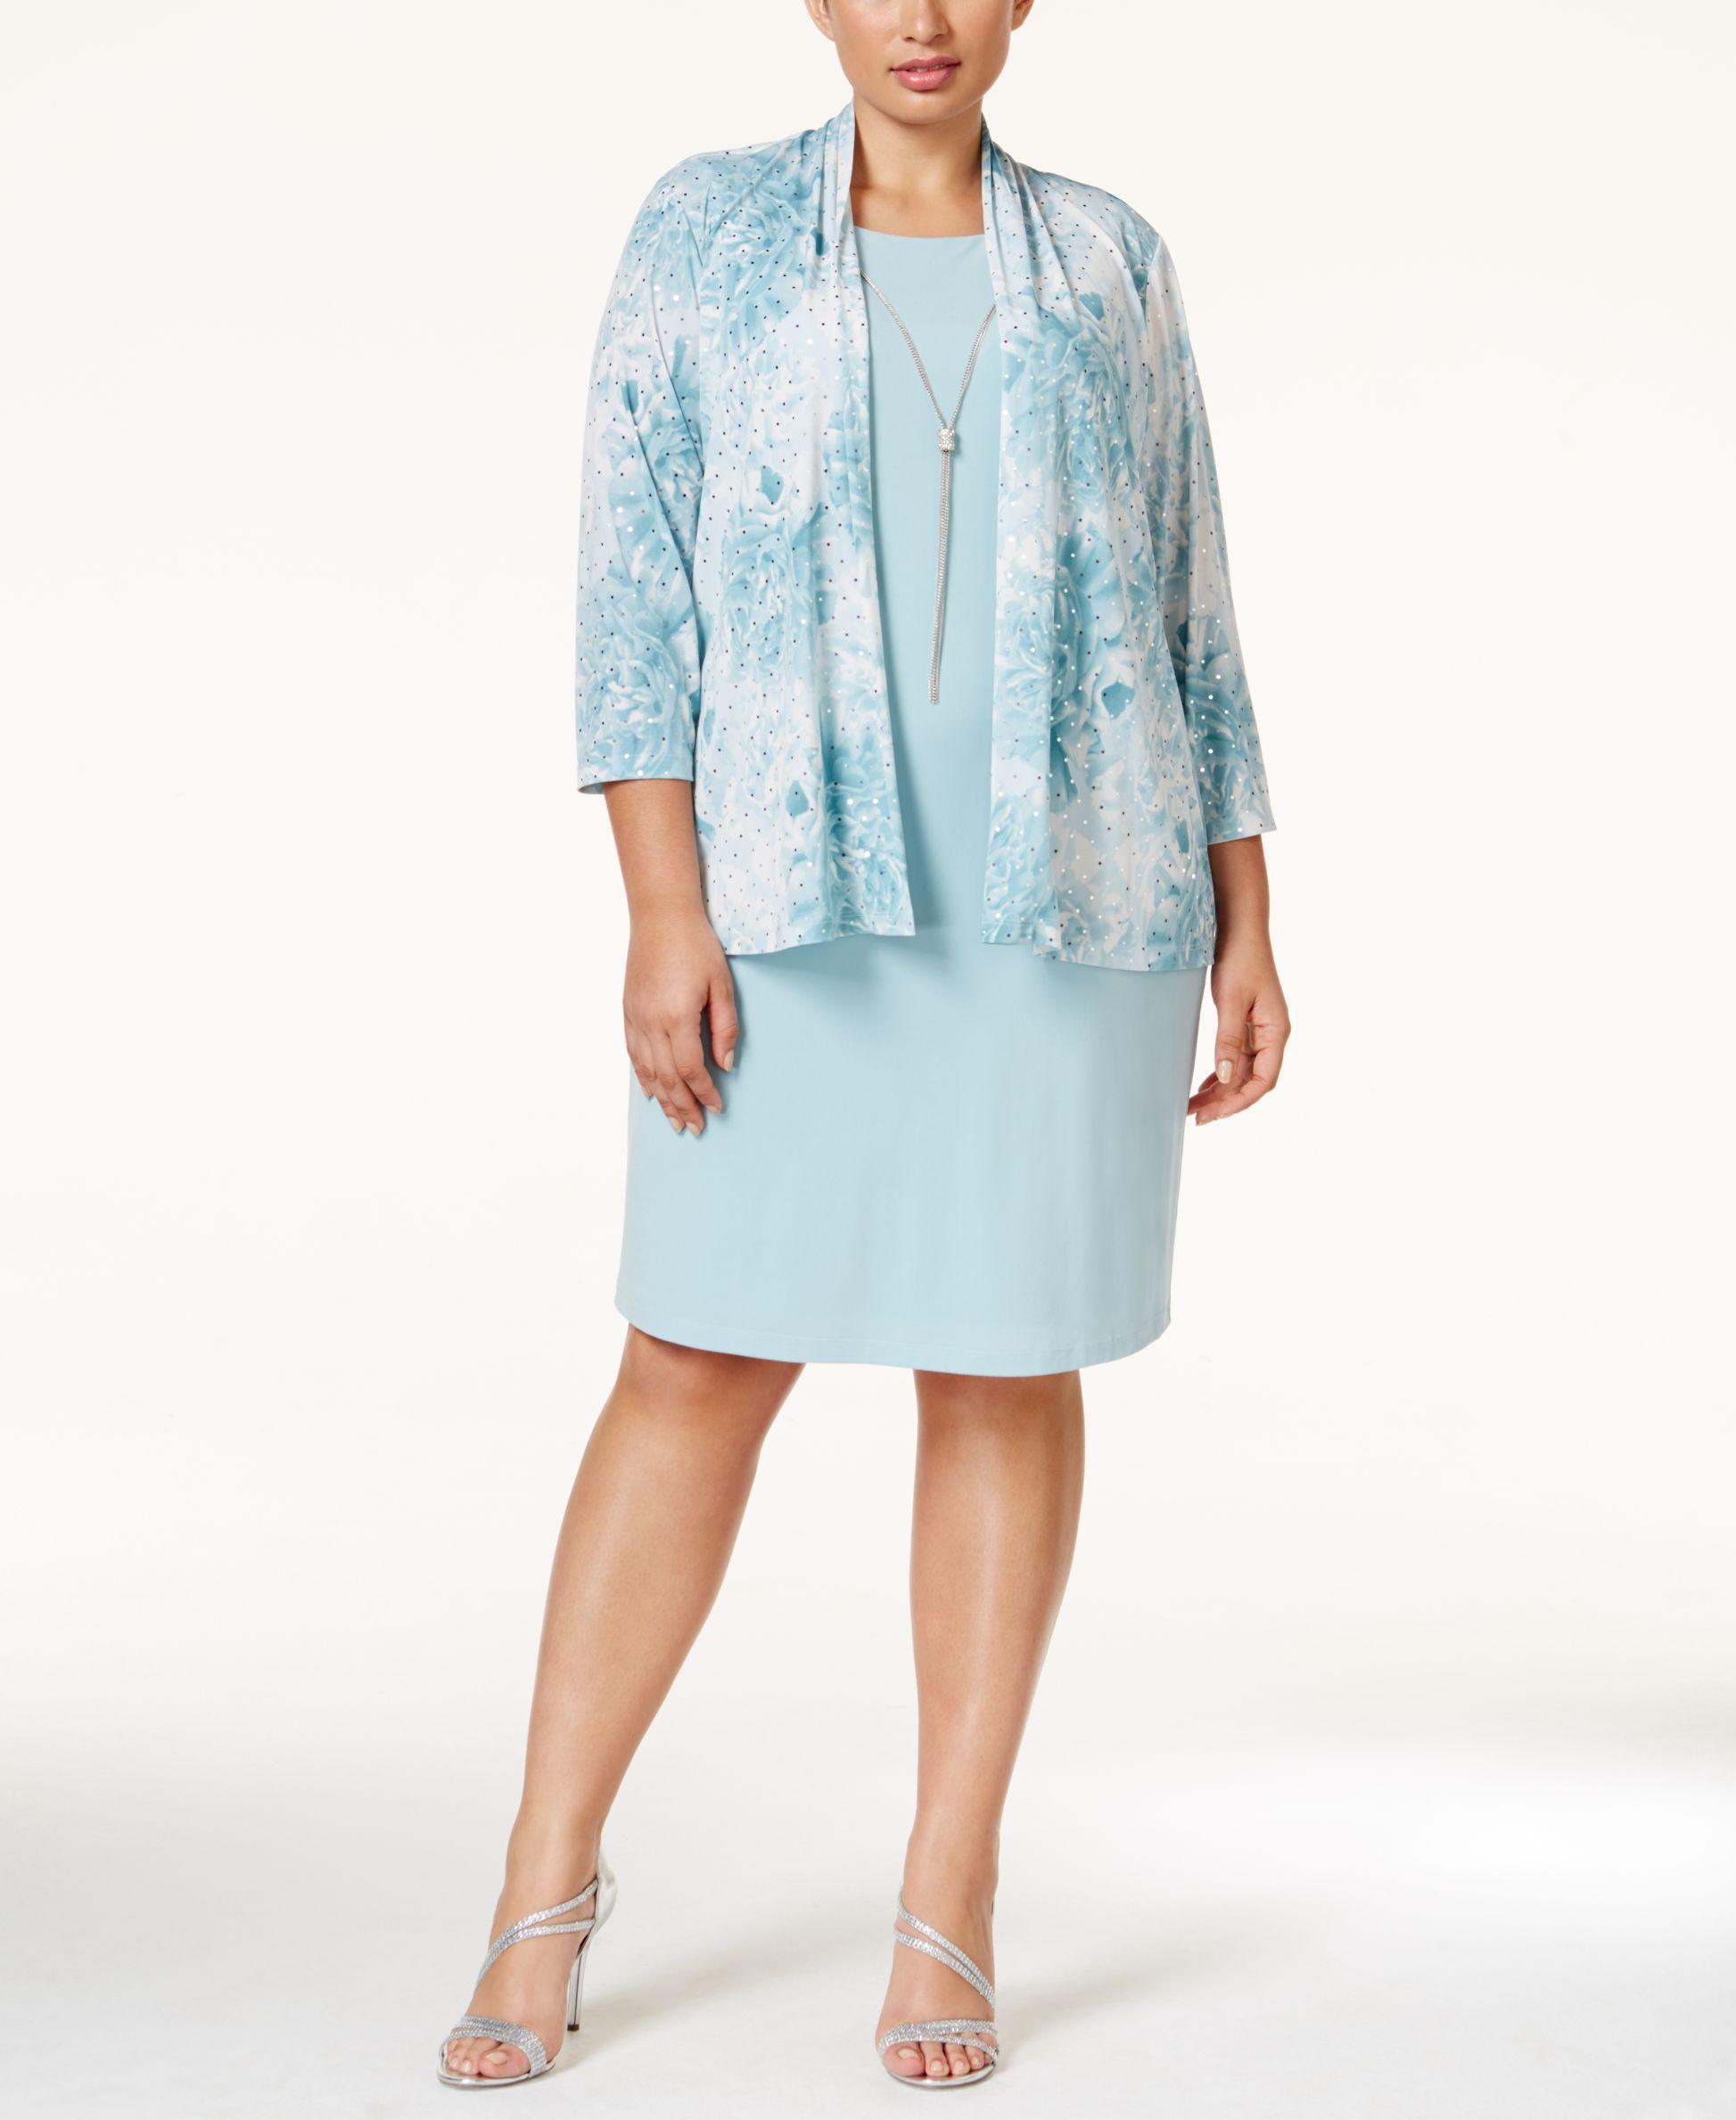 Plus size jacket dress for wedding  Jessica Howard Plus Size LayeredLook Sheath Dress and Printed